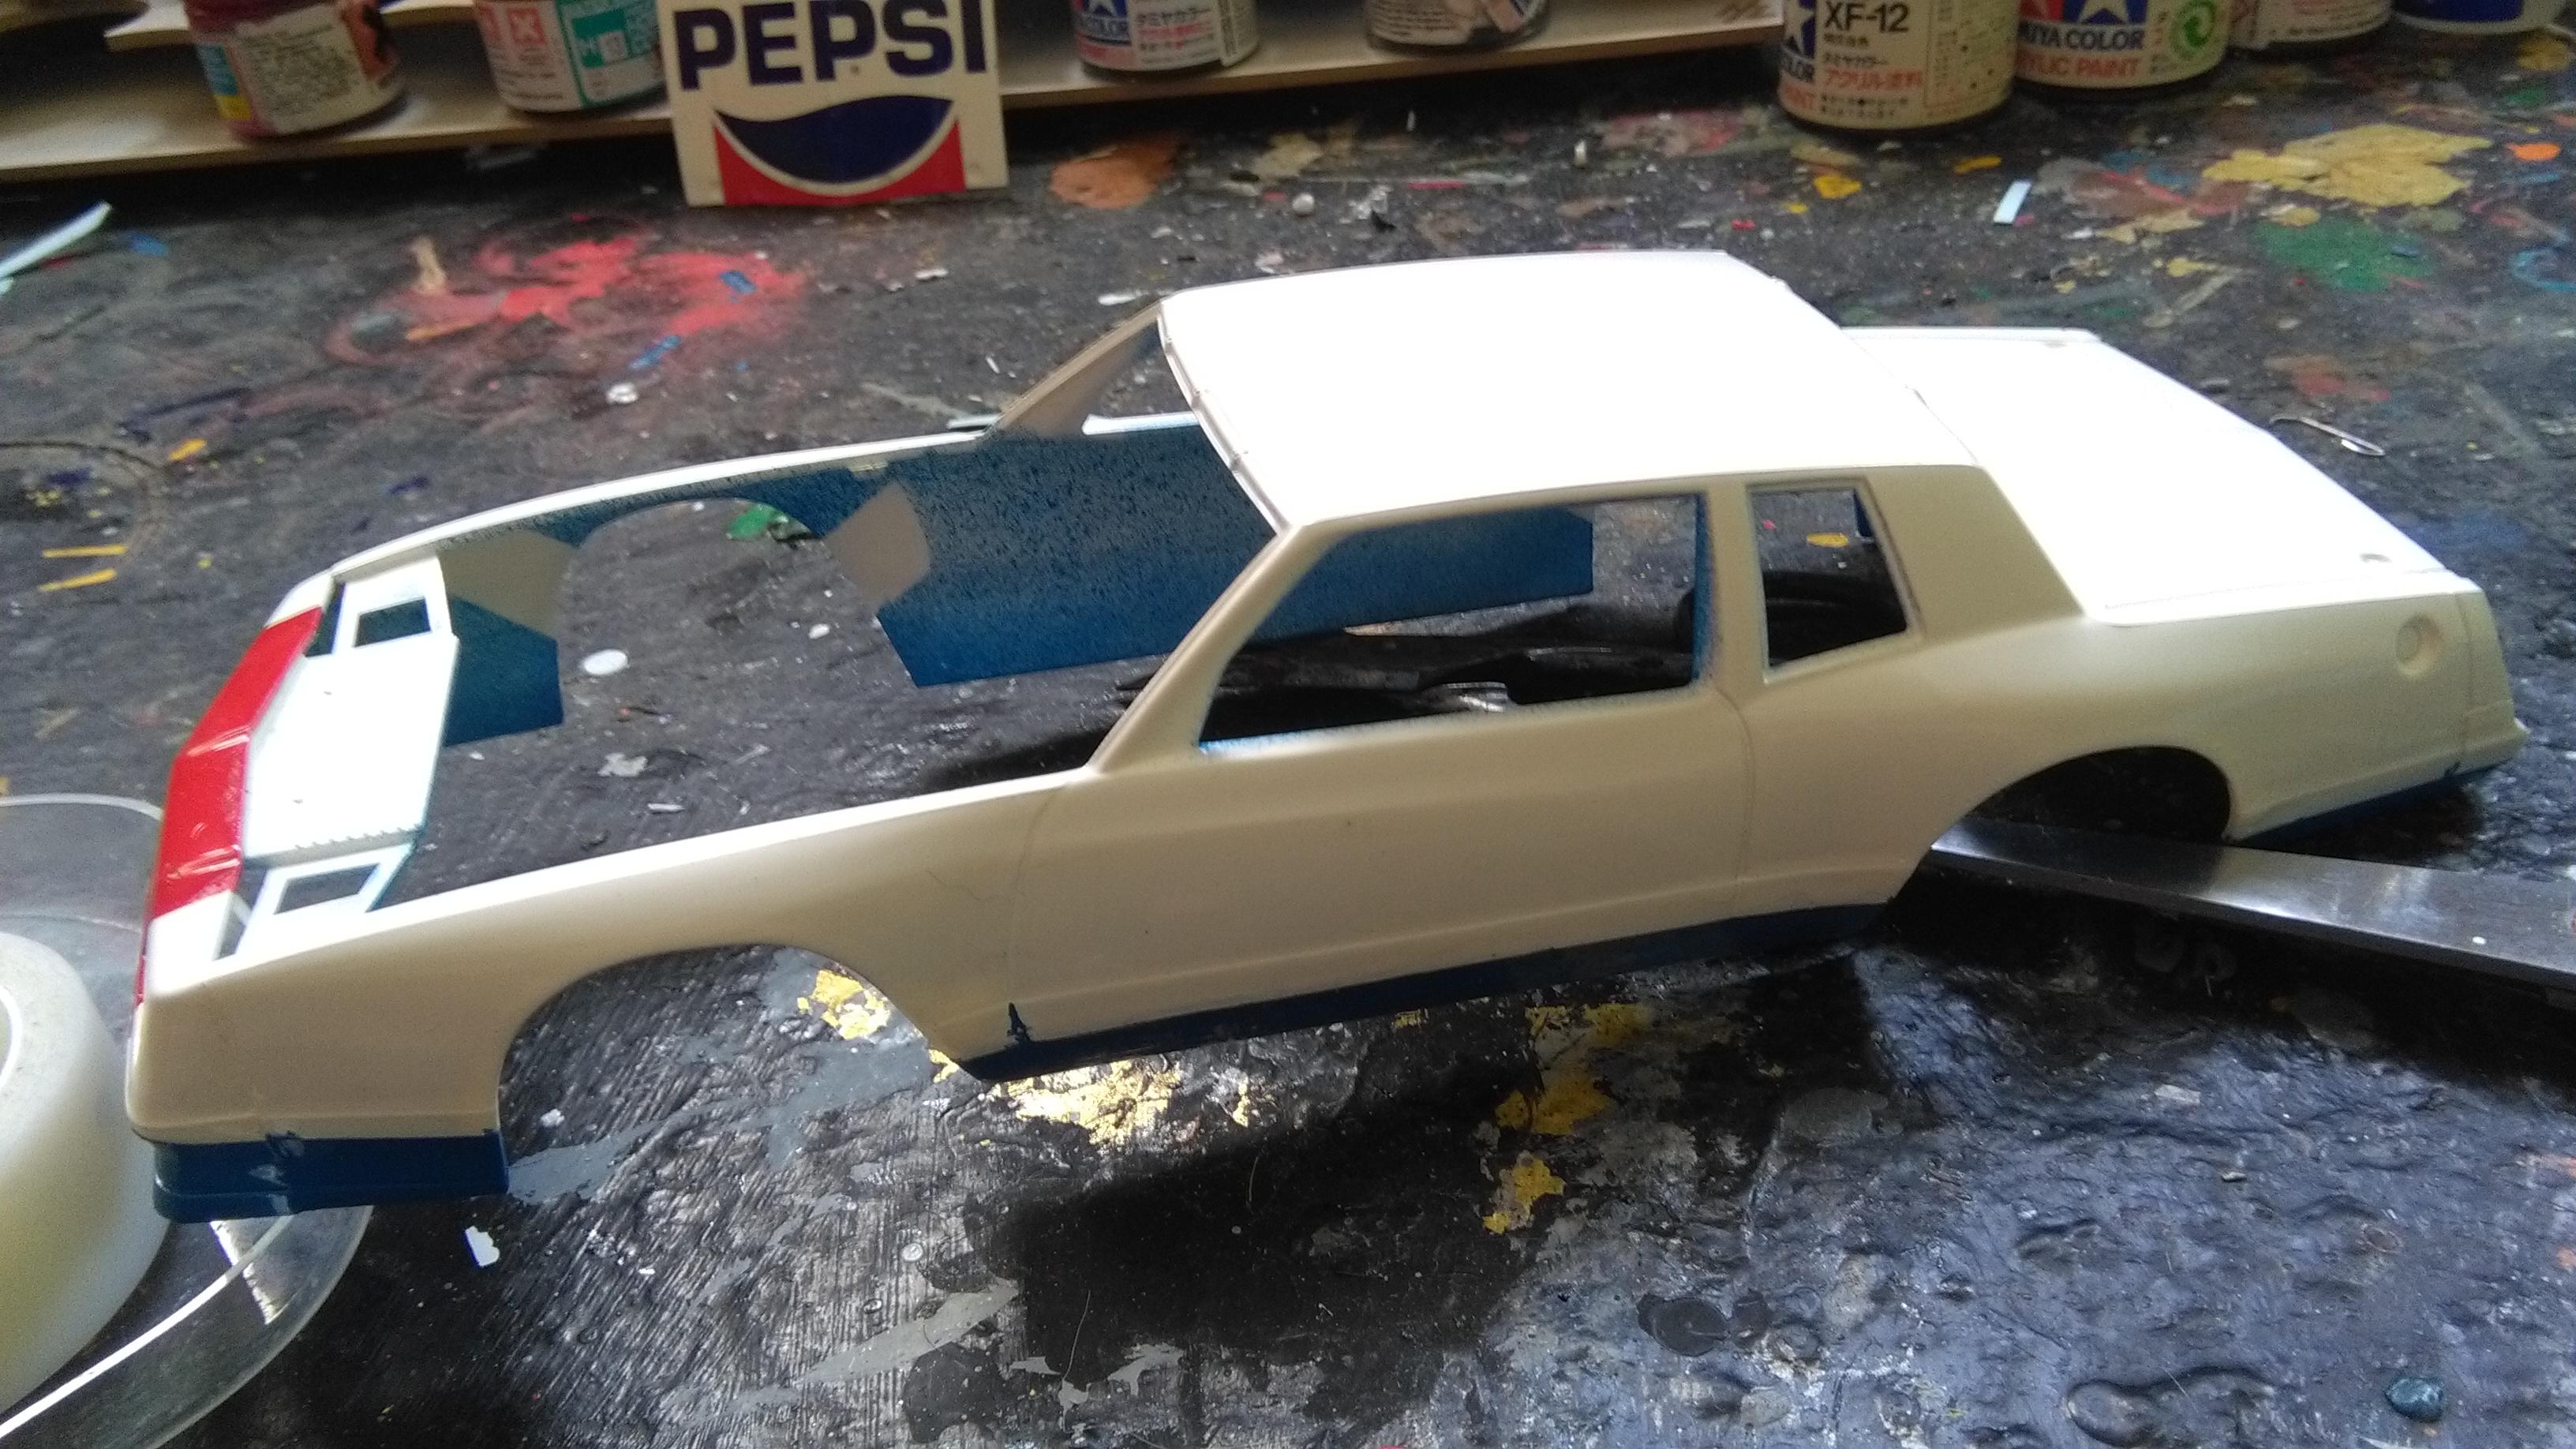 Chevy Monte-Carlo 1983 #11 Darrell Waltrip Pepsi  278234IMG20170429133214